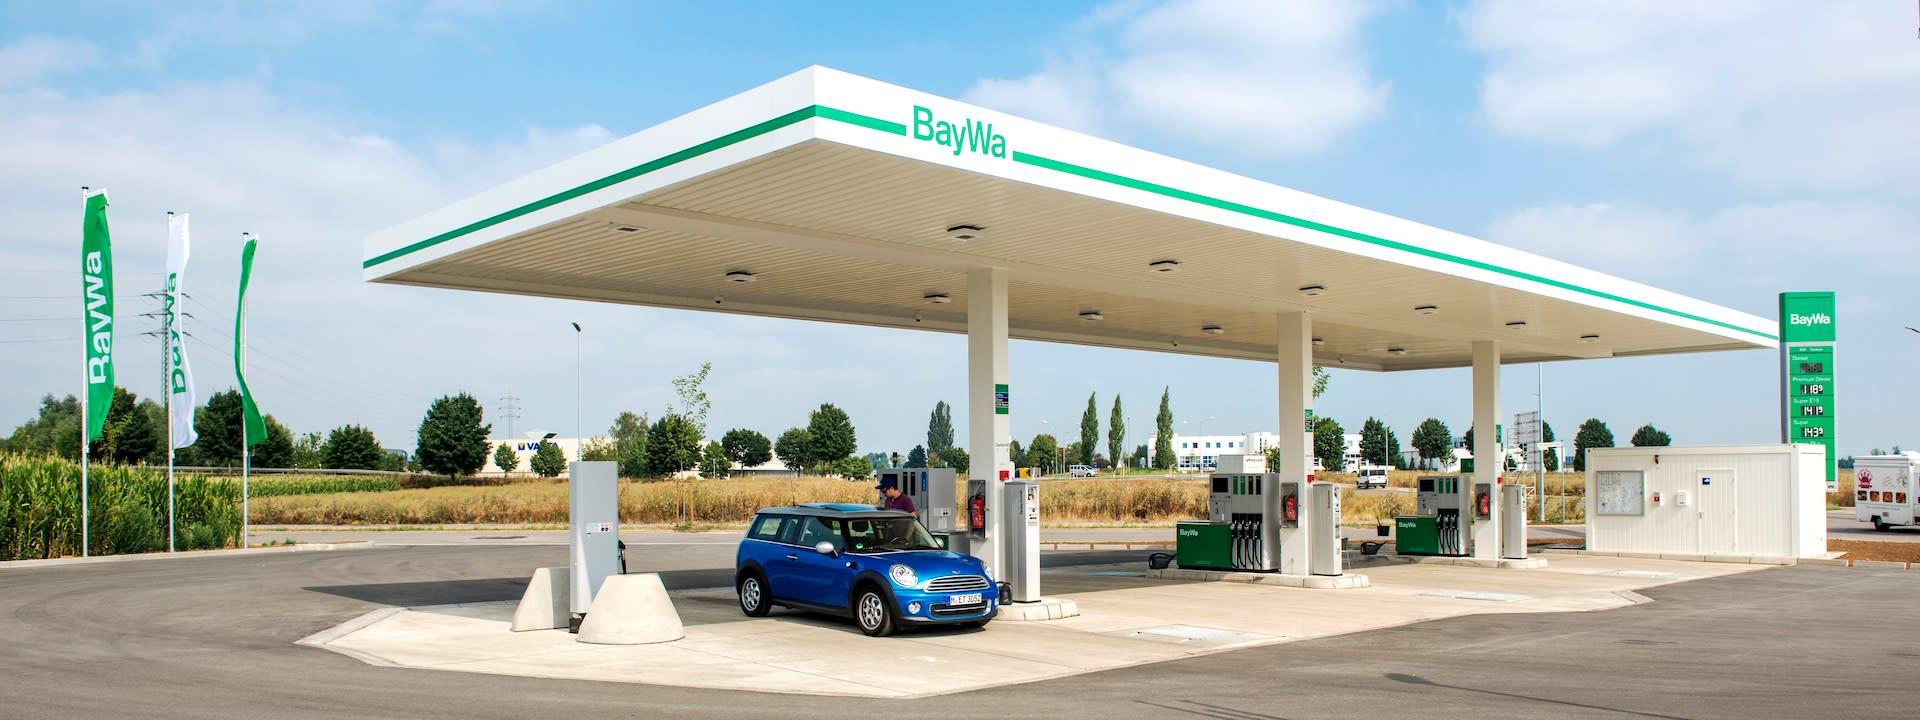 BayWa Tankstelle Chemnitz